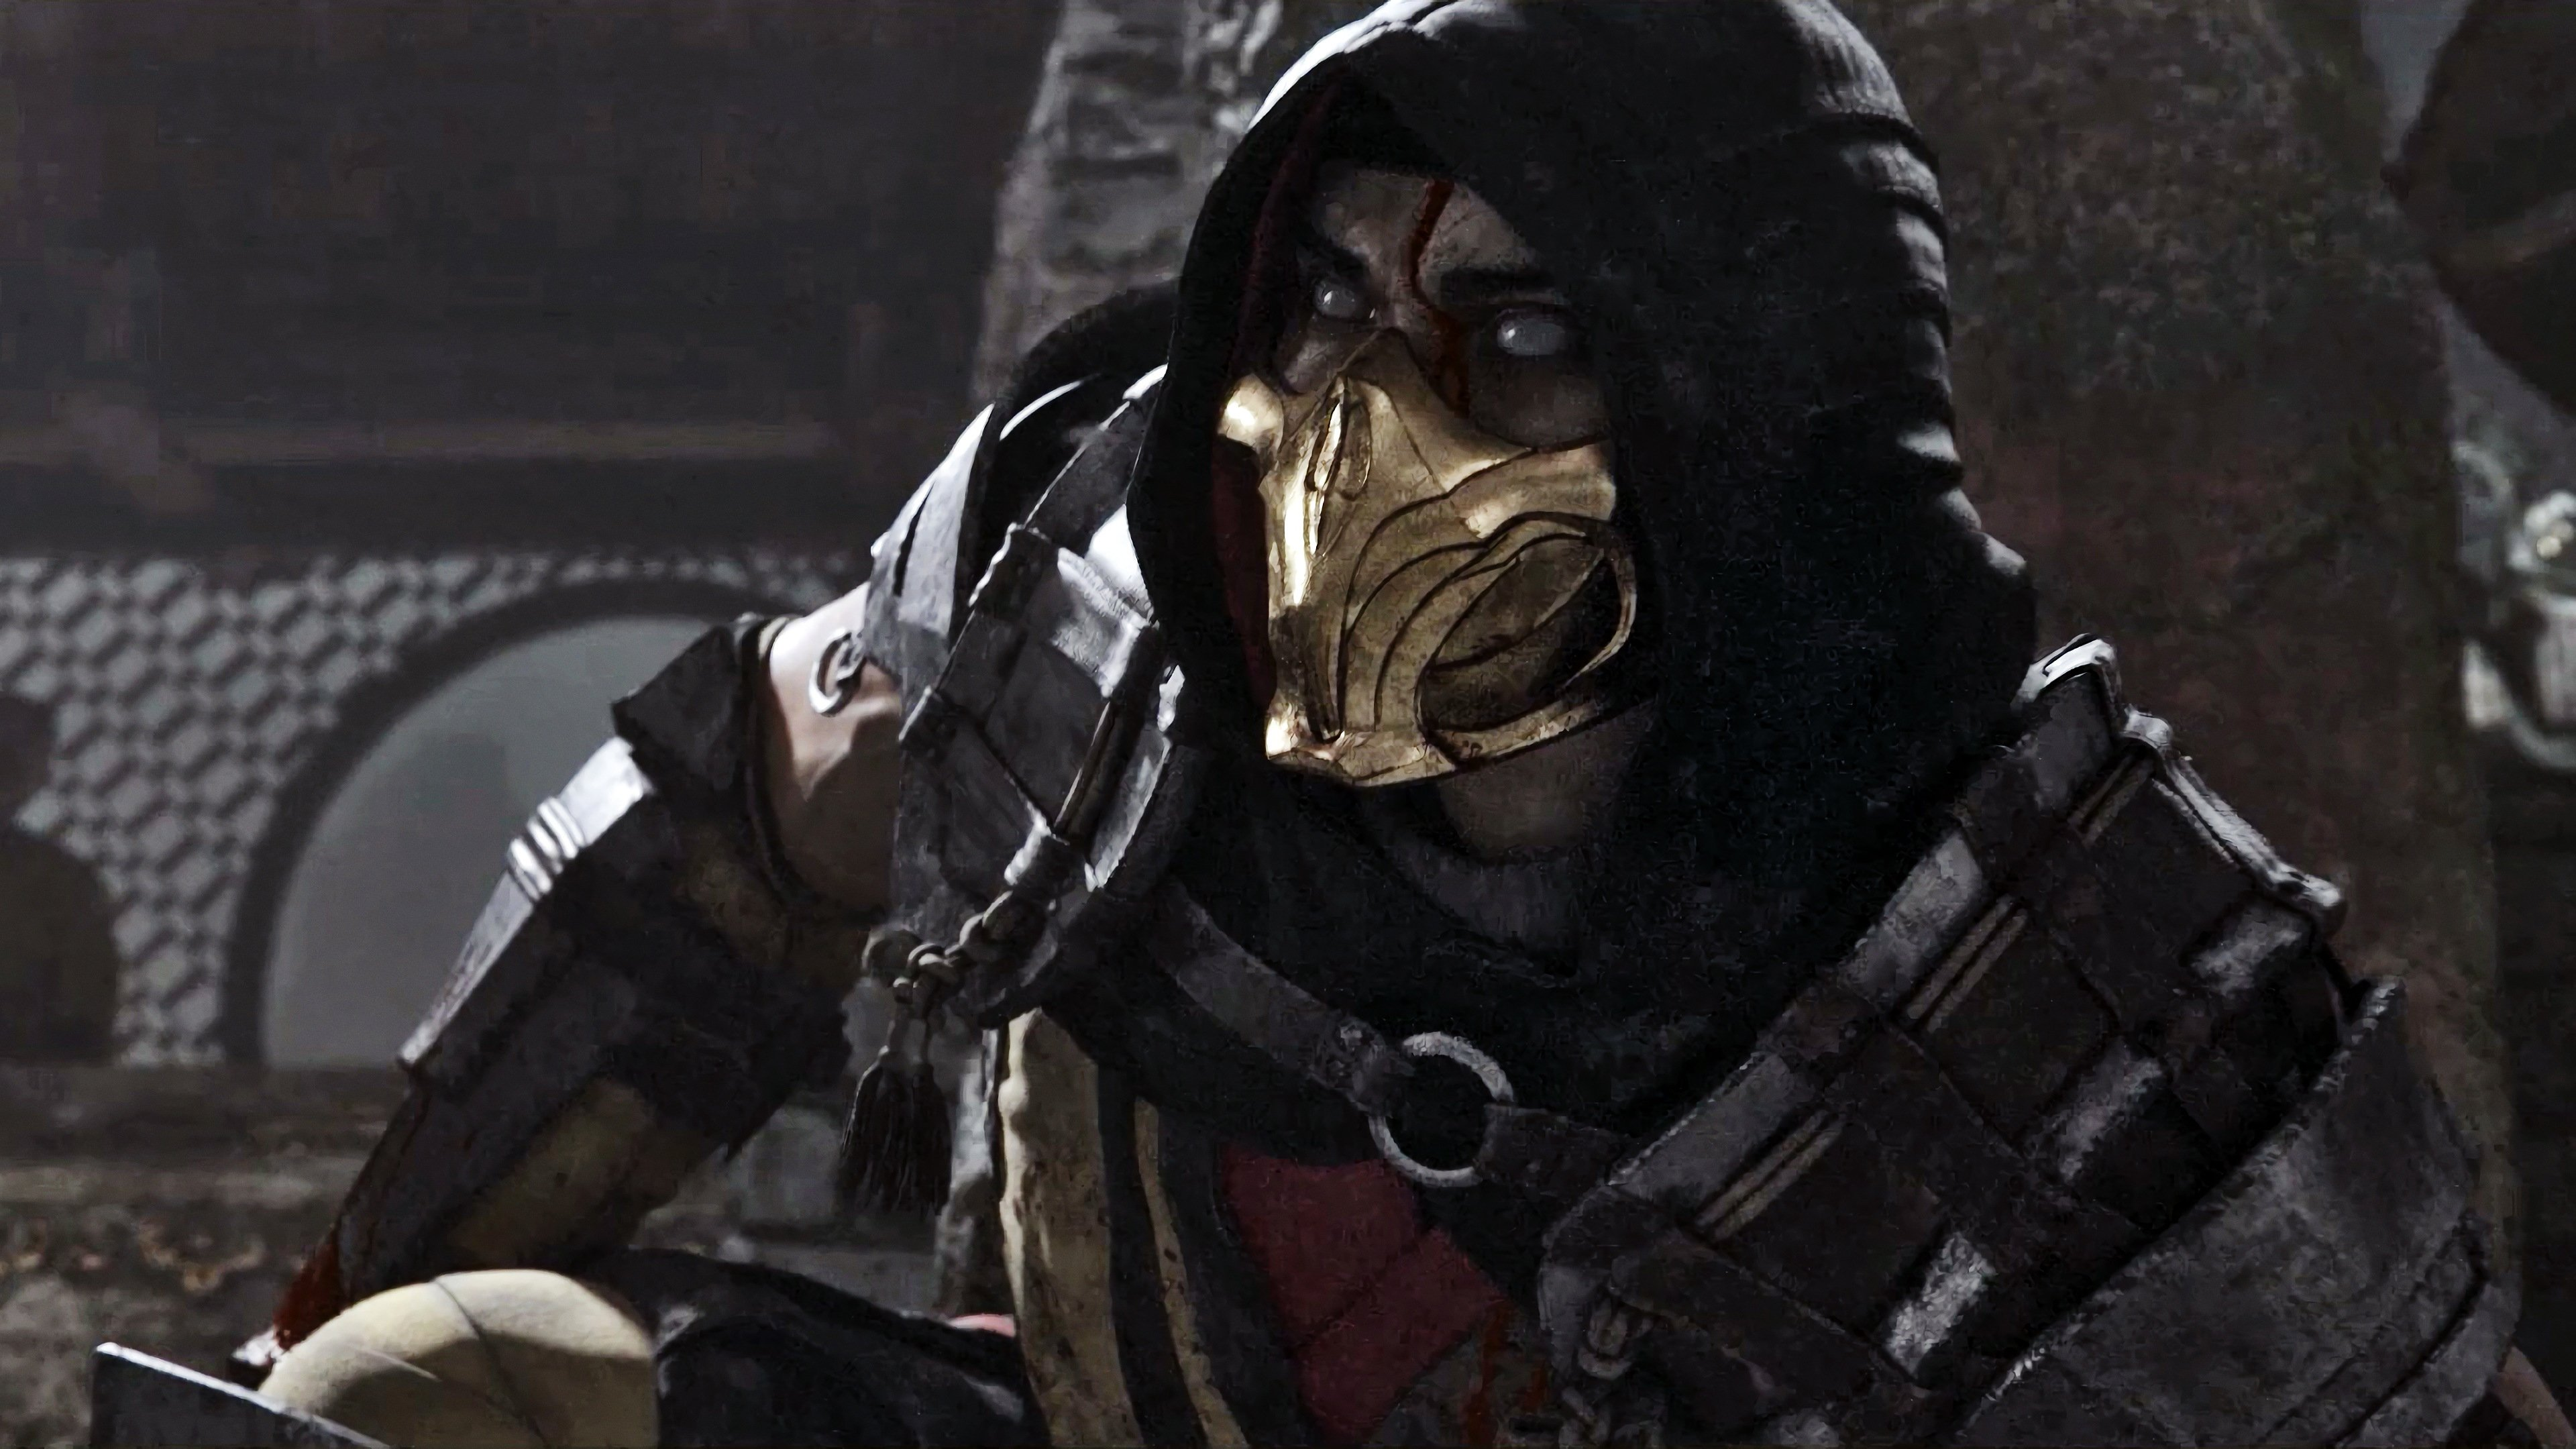 Free Download Mortal Kombat 11 4k 8k Hd Wallpaper 3840x2160 For